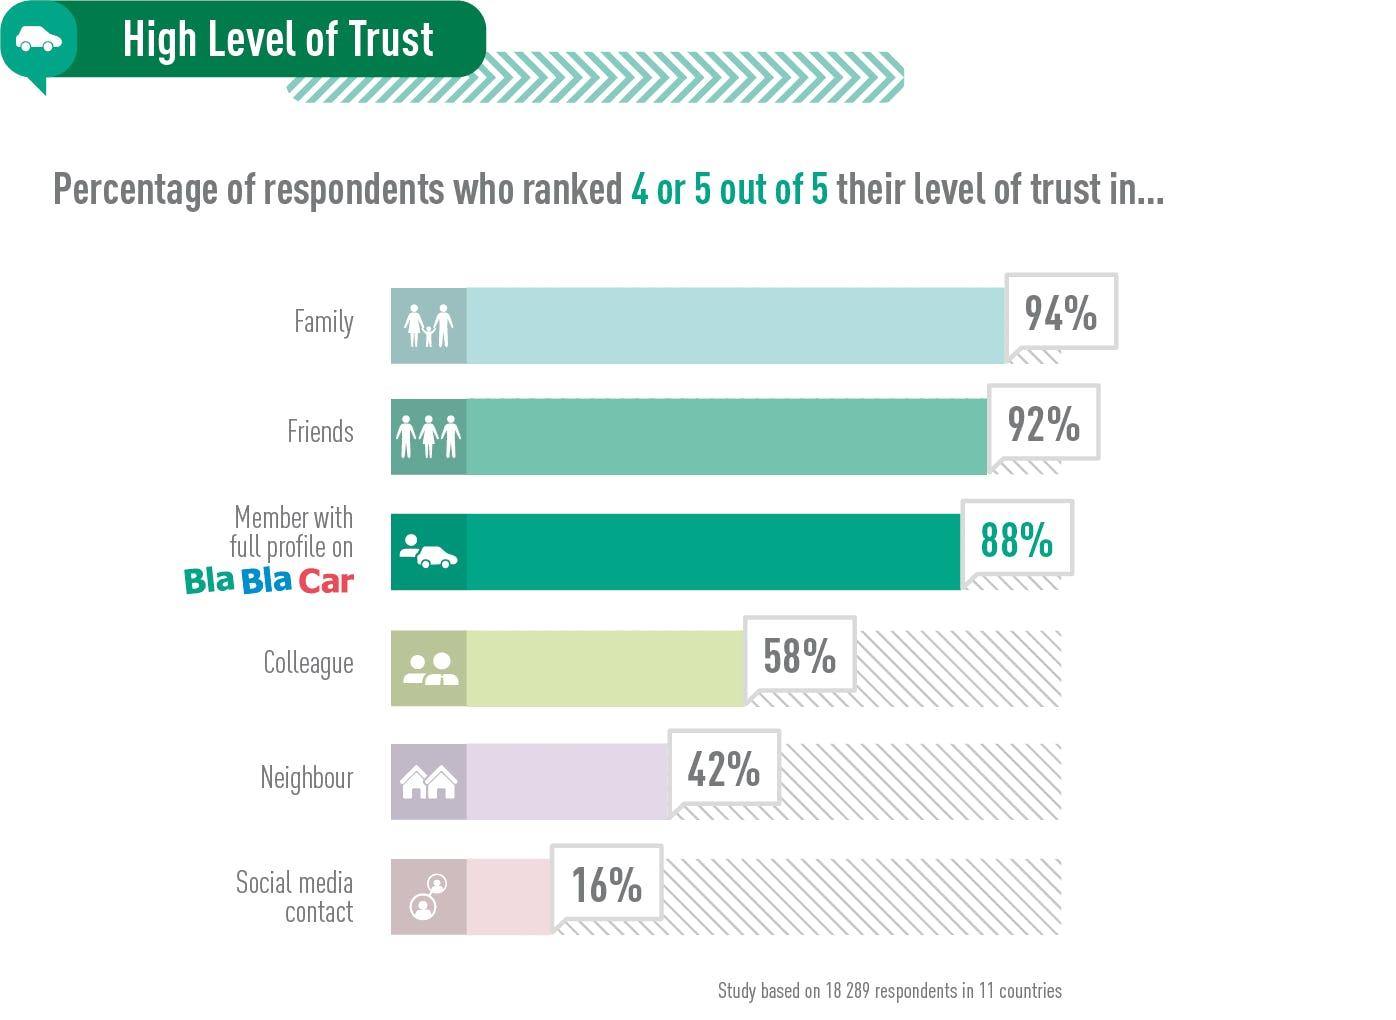 The high level of trust in BlaBlabCar